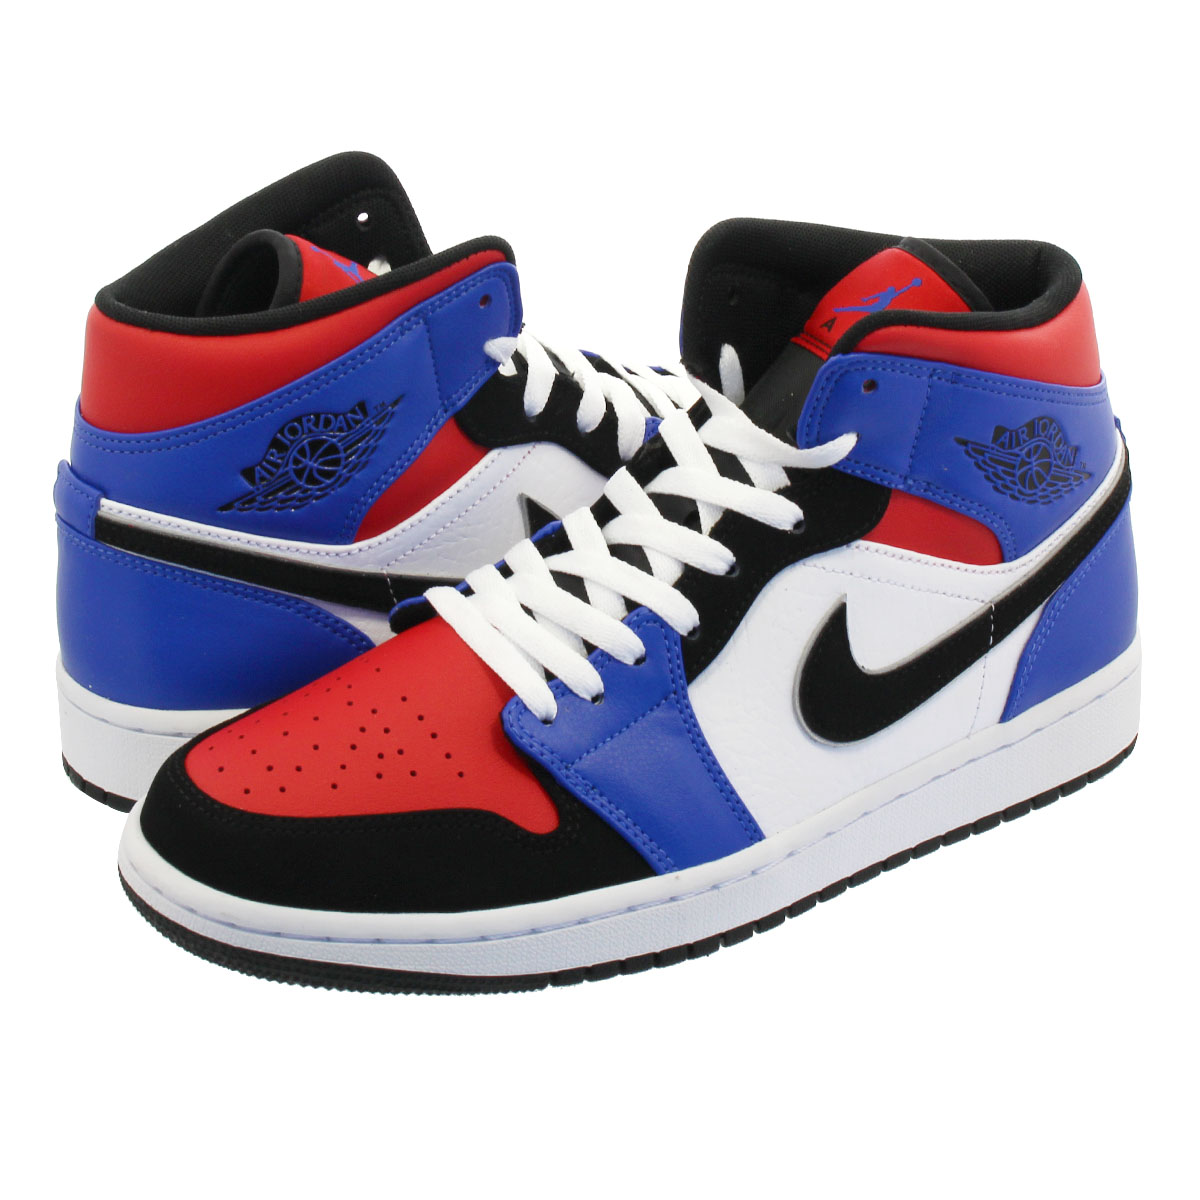 69b4c820196 NIKE AIR JORDAN 1 MID Nike Air Jordan 1 mid WHITE BLACK HYPER ROYAL UNIVERSITY  RED 554